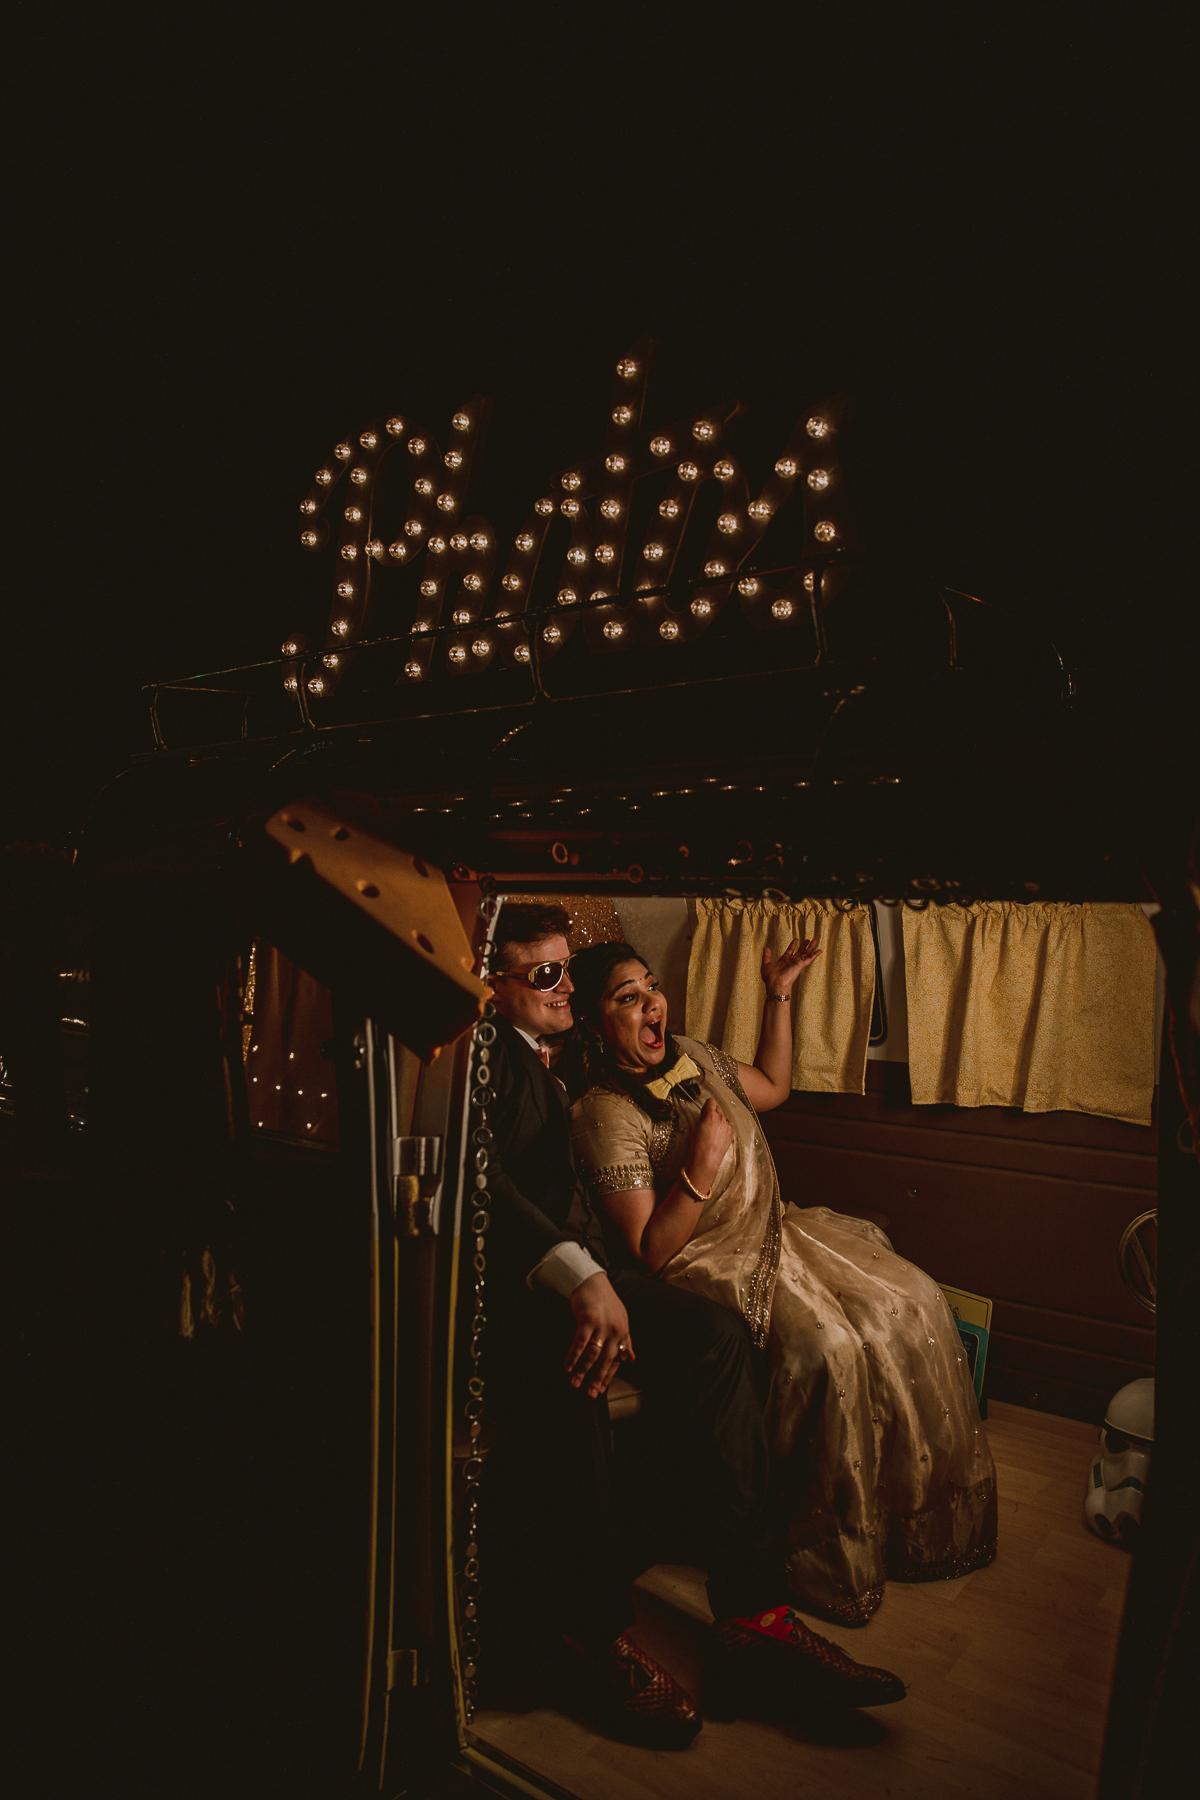 eventide-brewery-indian-american-fusion-kelley-raye-atlanta-los-angeles-wedding-photographer-125.jpg